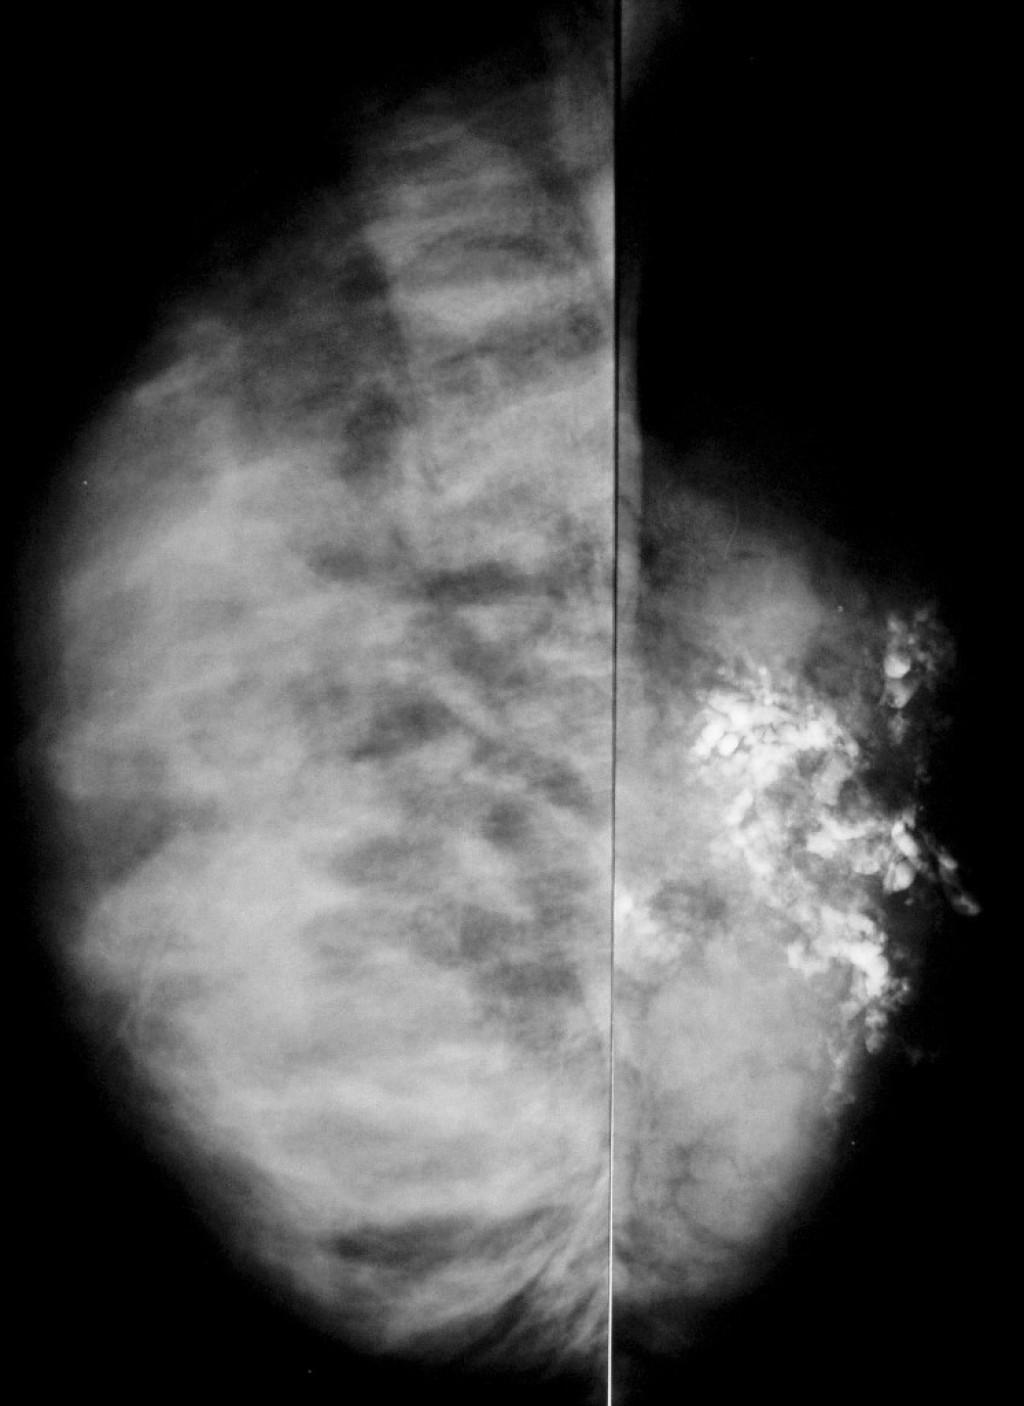 Ювенильный папилломатоз (Swiss cheese disease)